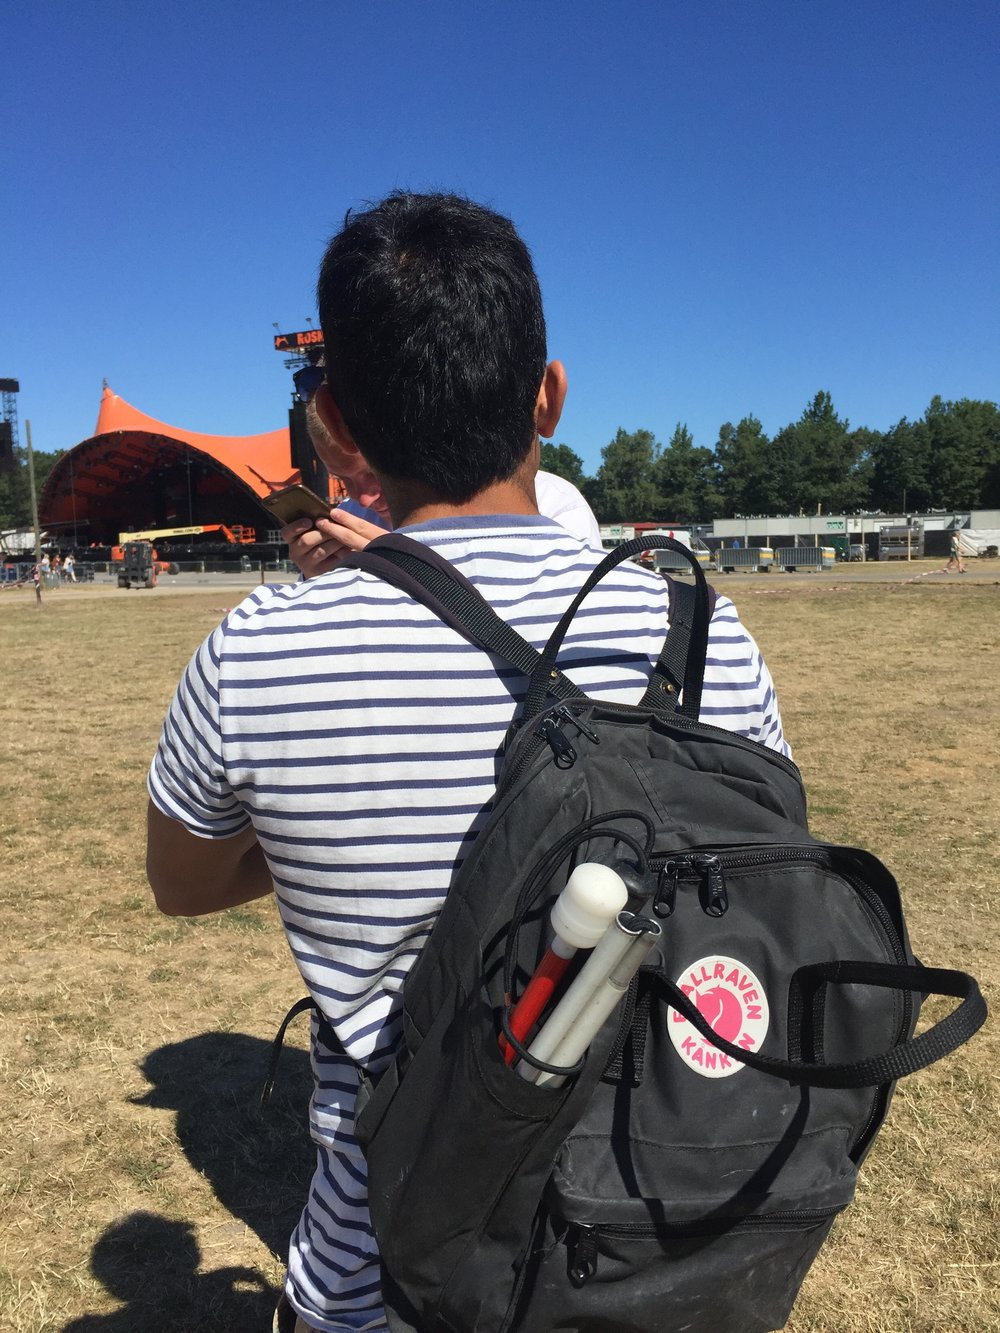 Jens set bagfra, kigger mod orange scene